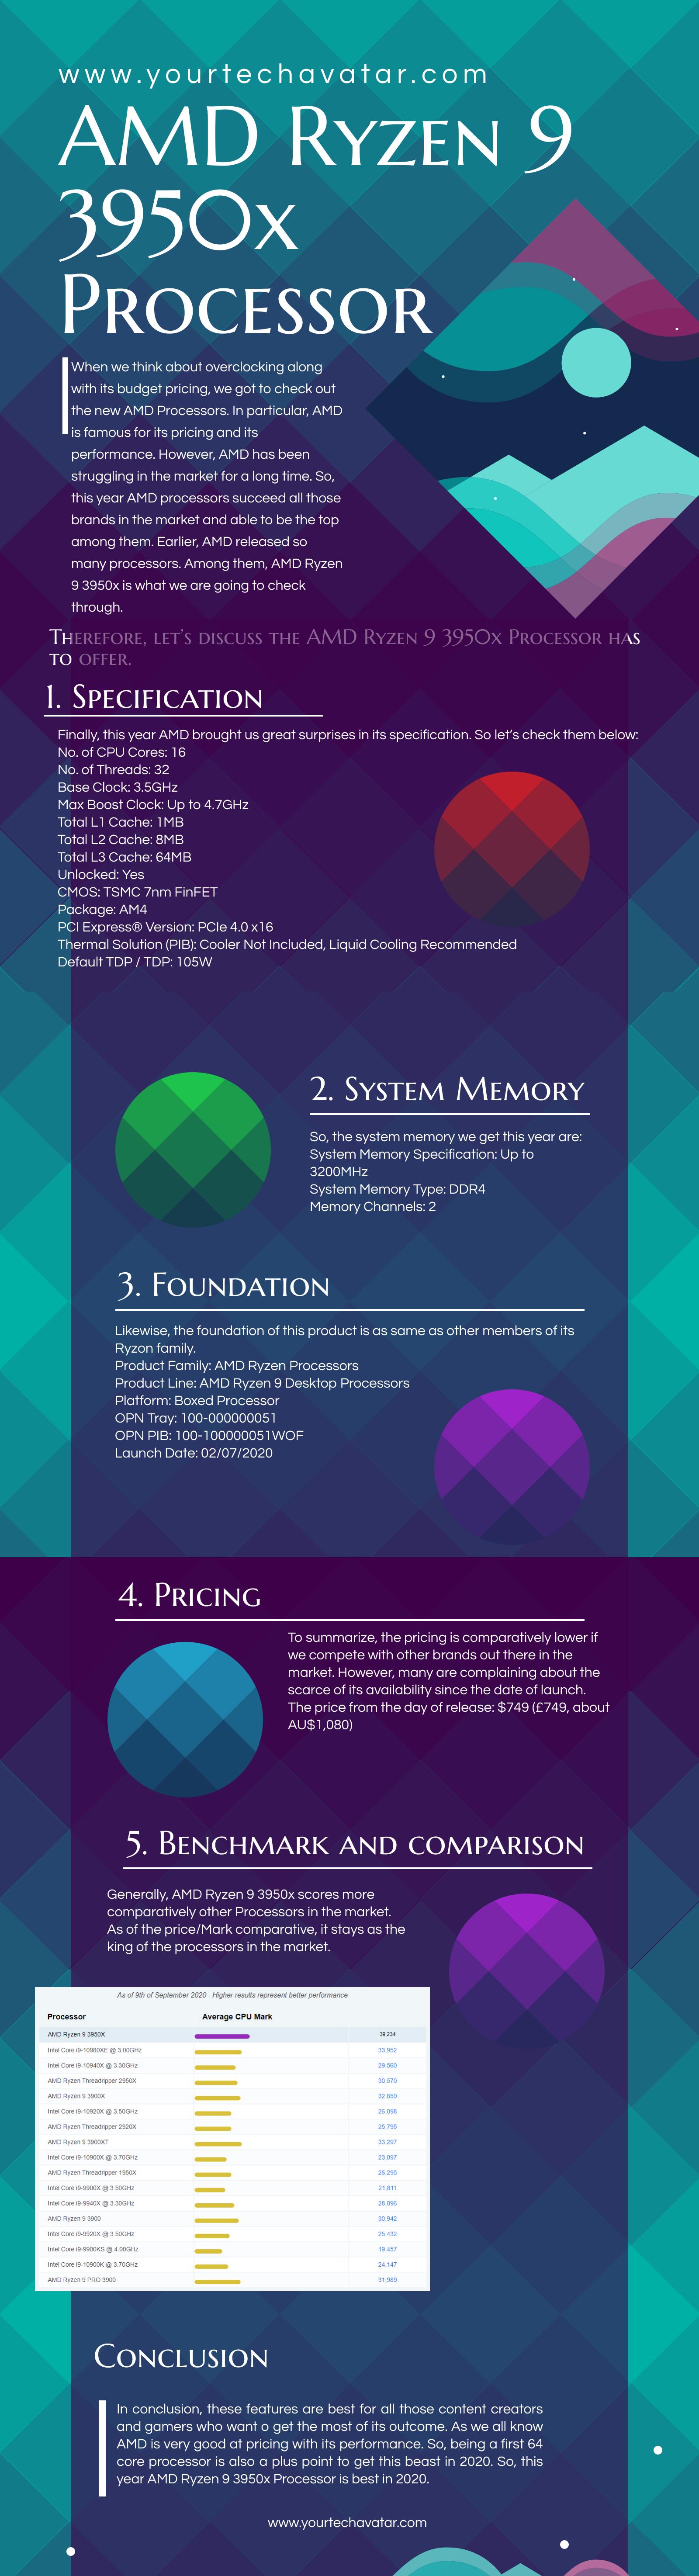 Infographic for AMD Ryzen 9 3950x Processor